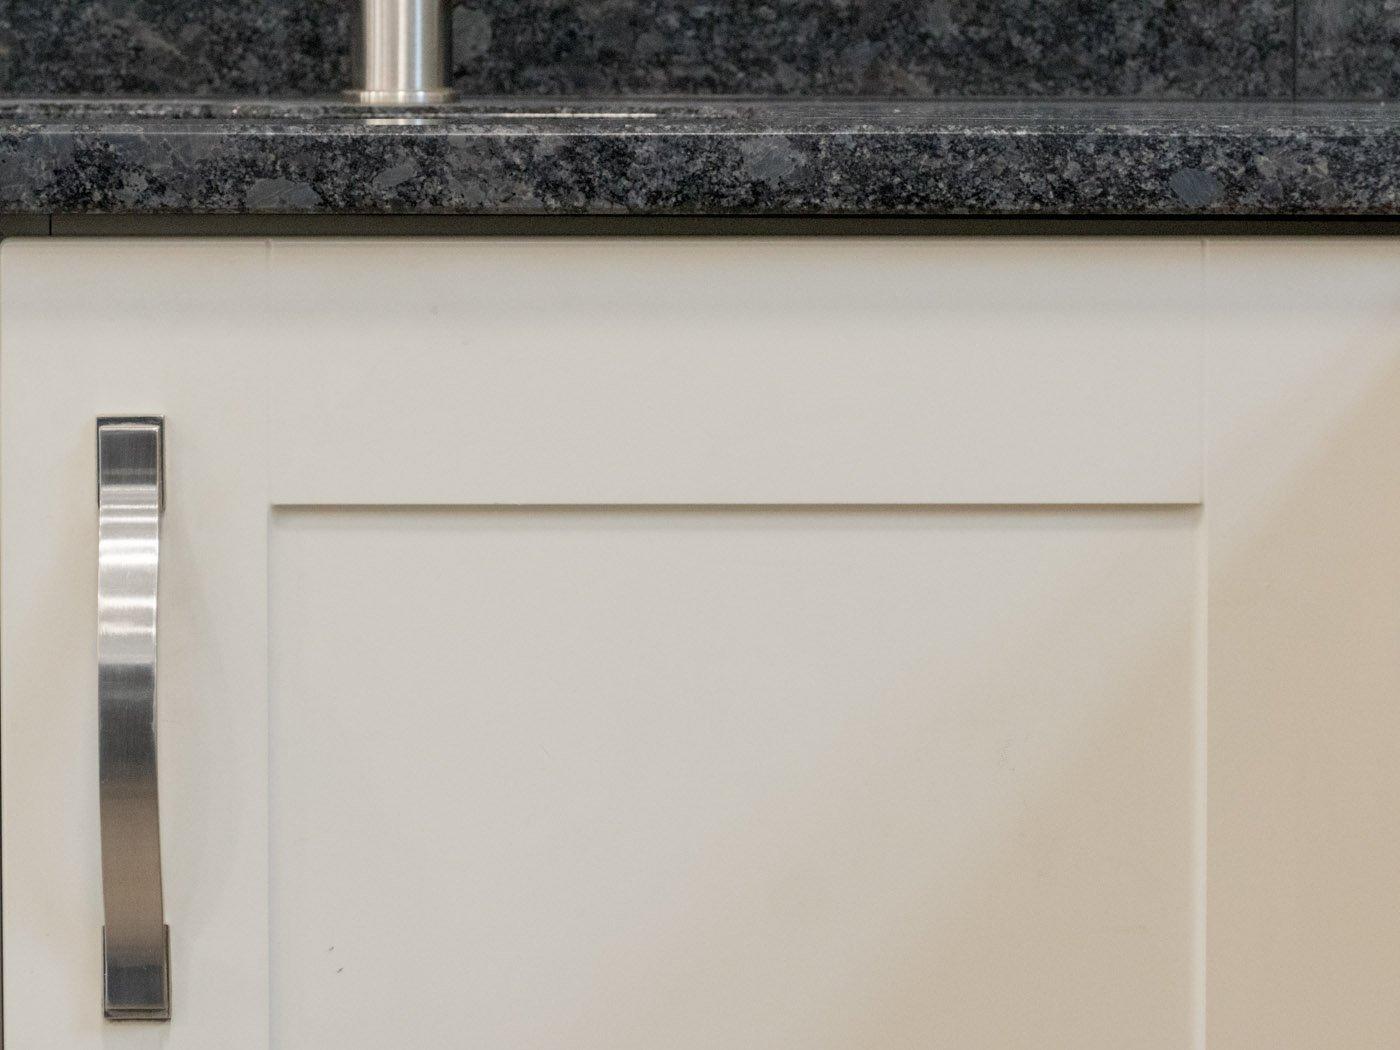 steel-grey-bevel-edge-profile-on-grey-shaker-kitchen